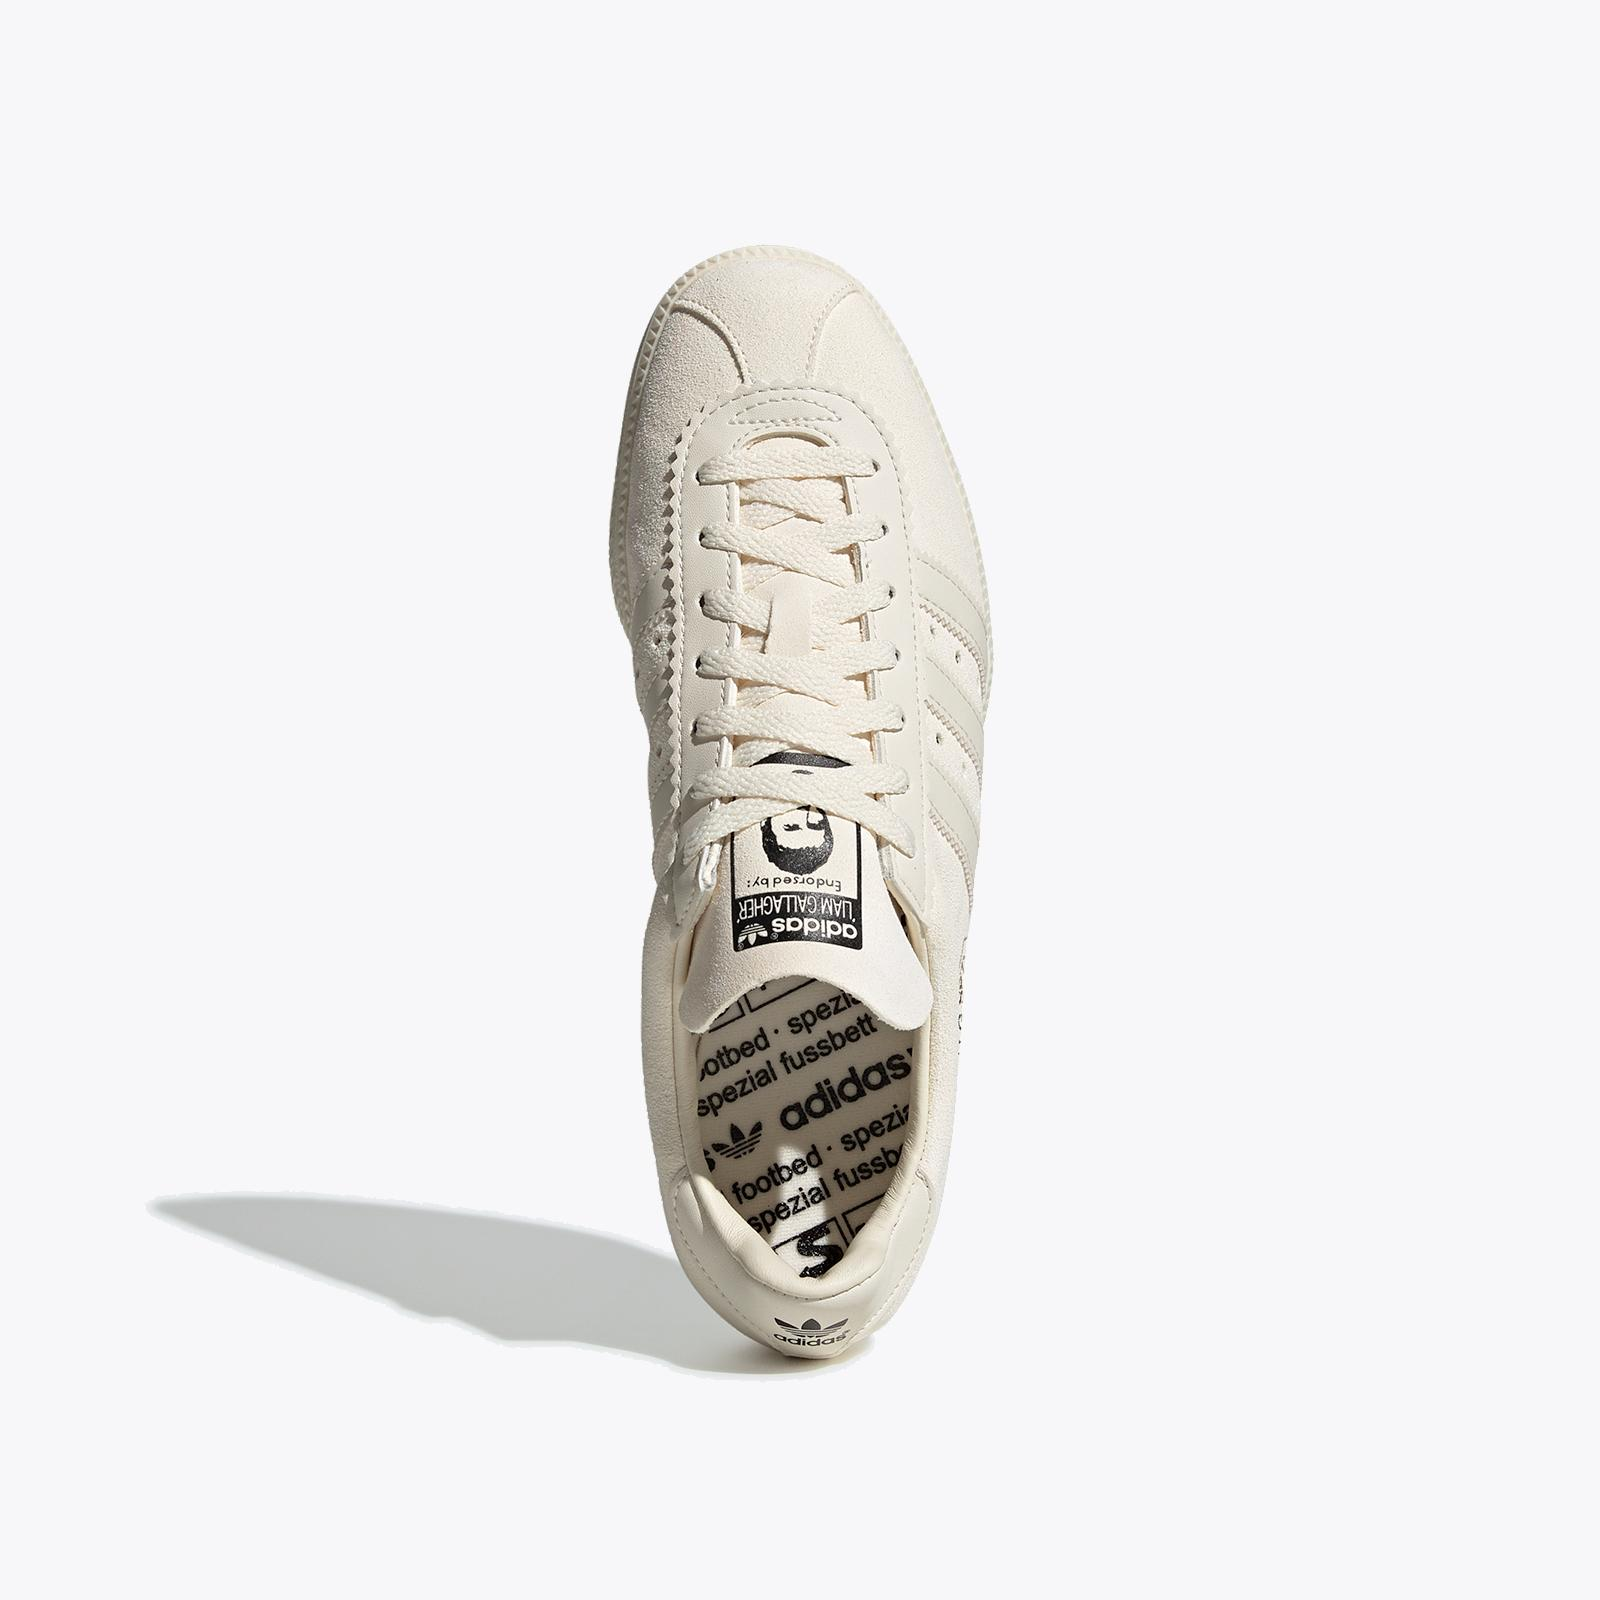 Liam Gallagher & adidas släpper en adidas Spezial sneaker